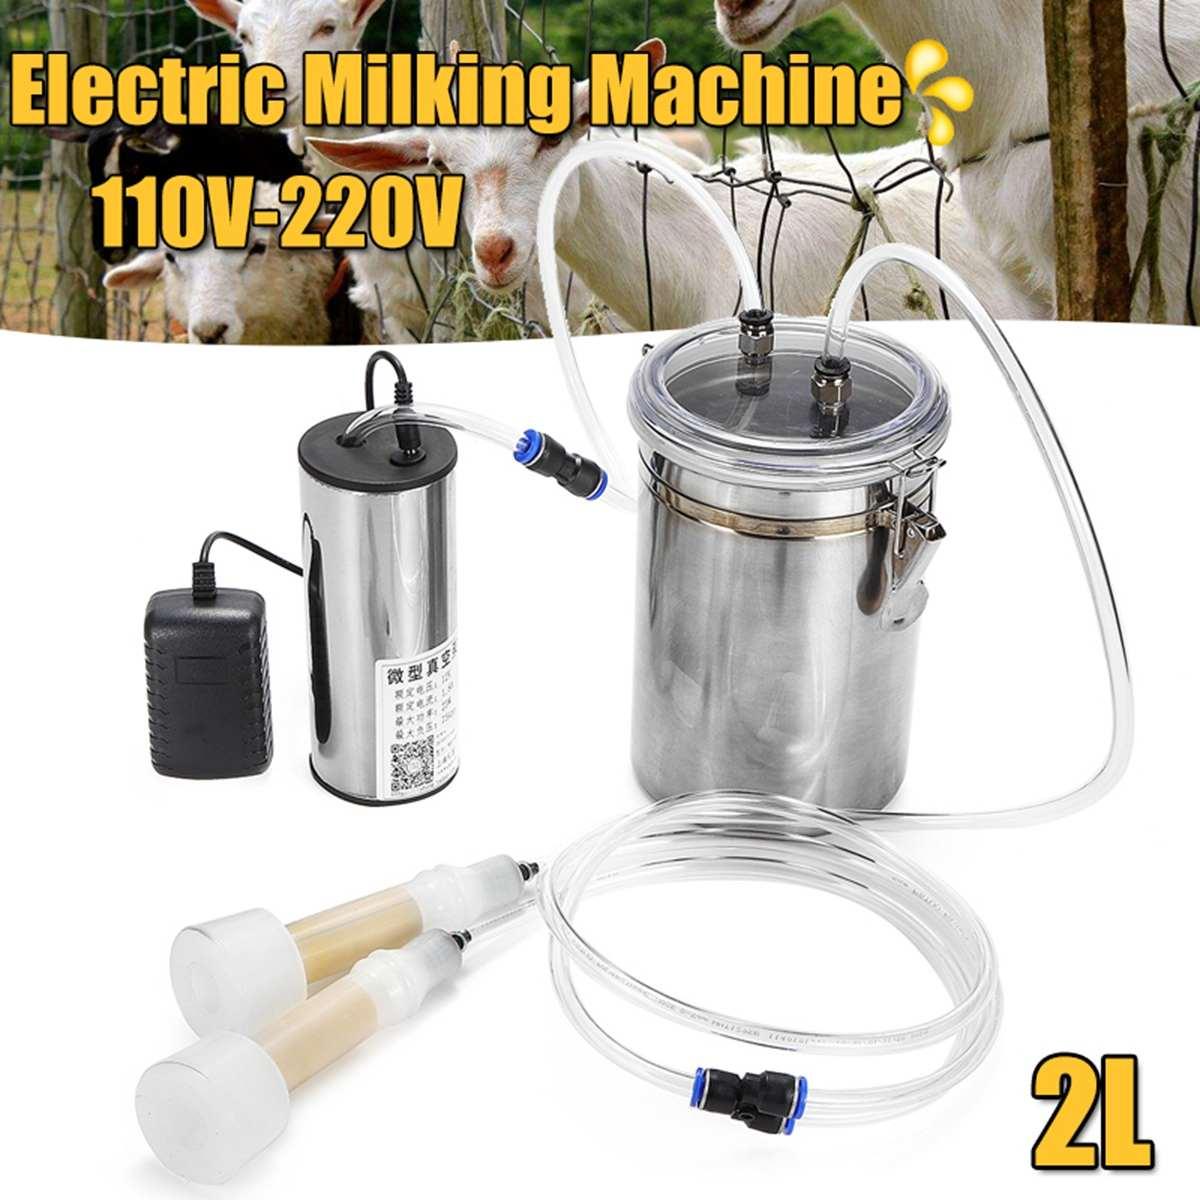 110-220V 2L 2 Teats Manual Electric Milking Machine Pump Kit Milker Barrel Cattle Cow Sheep Ewe Goat Dairy Tool Home Farm